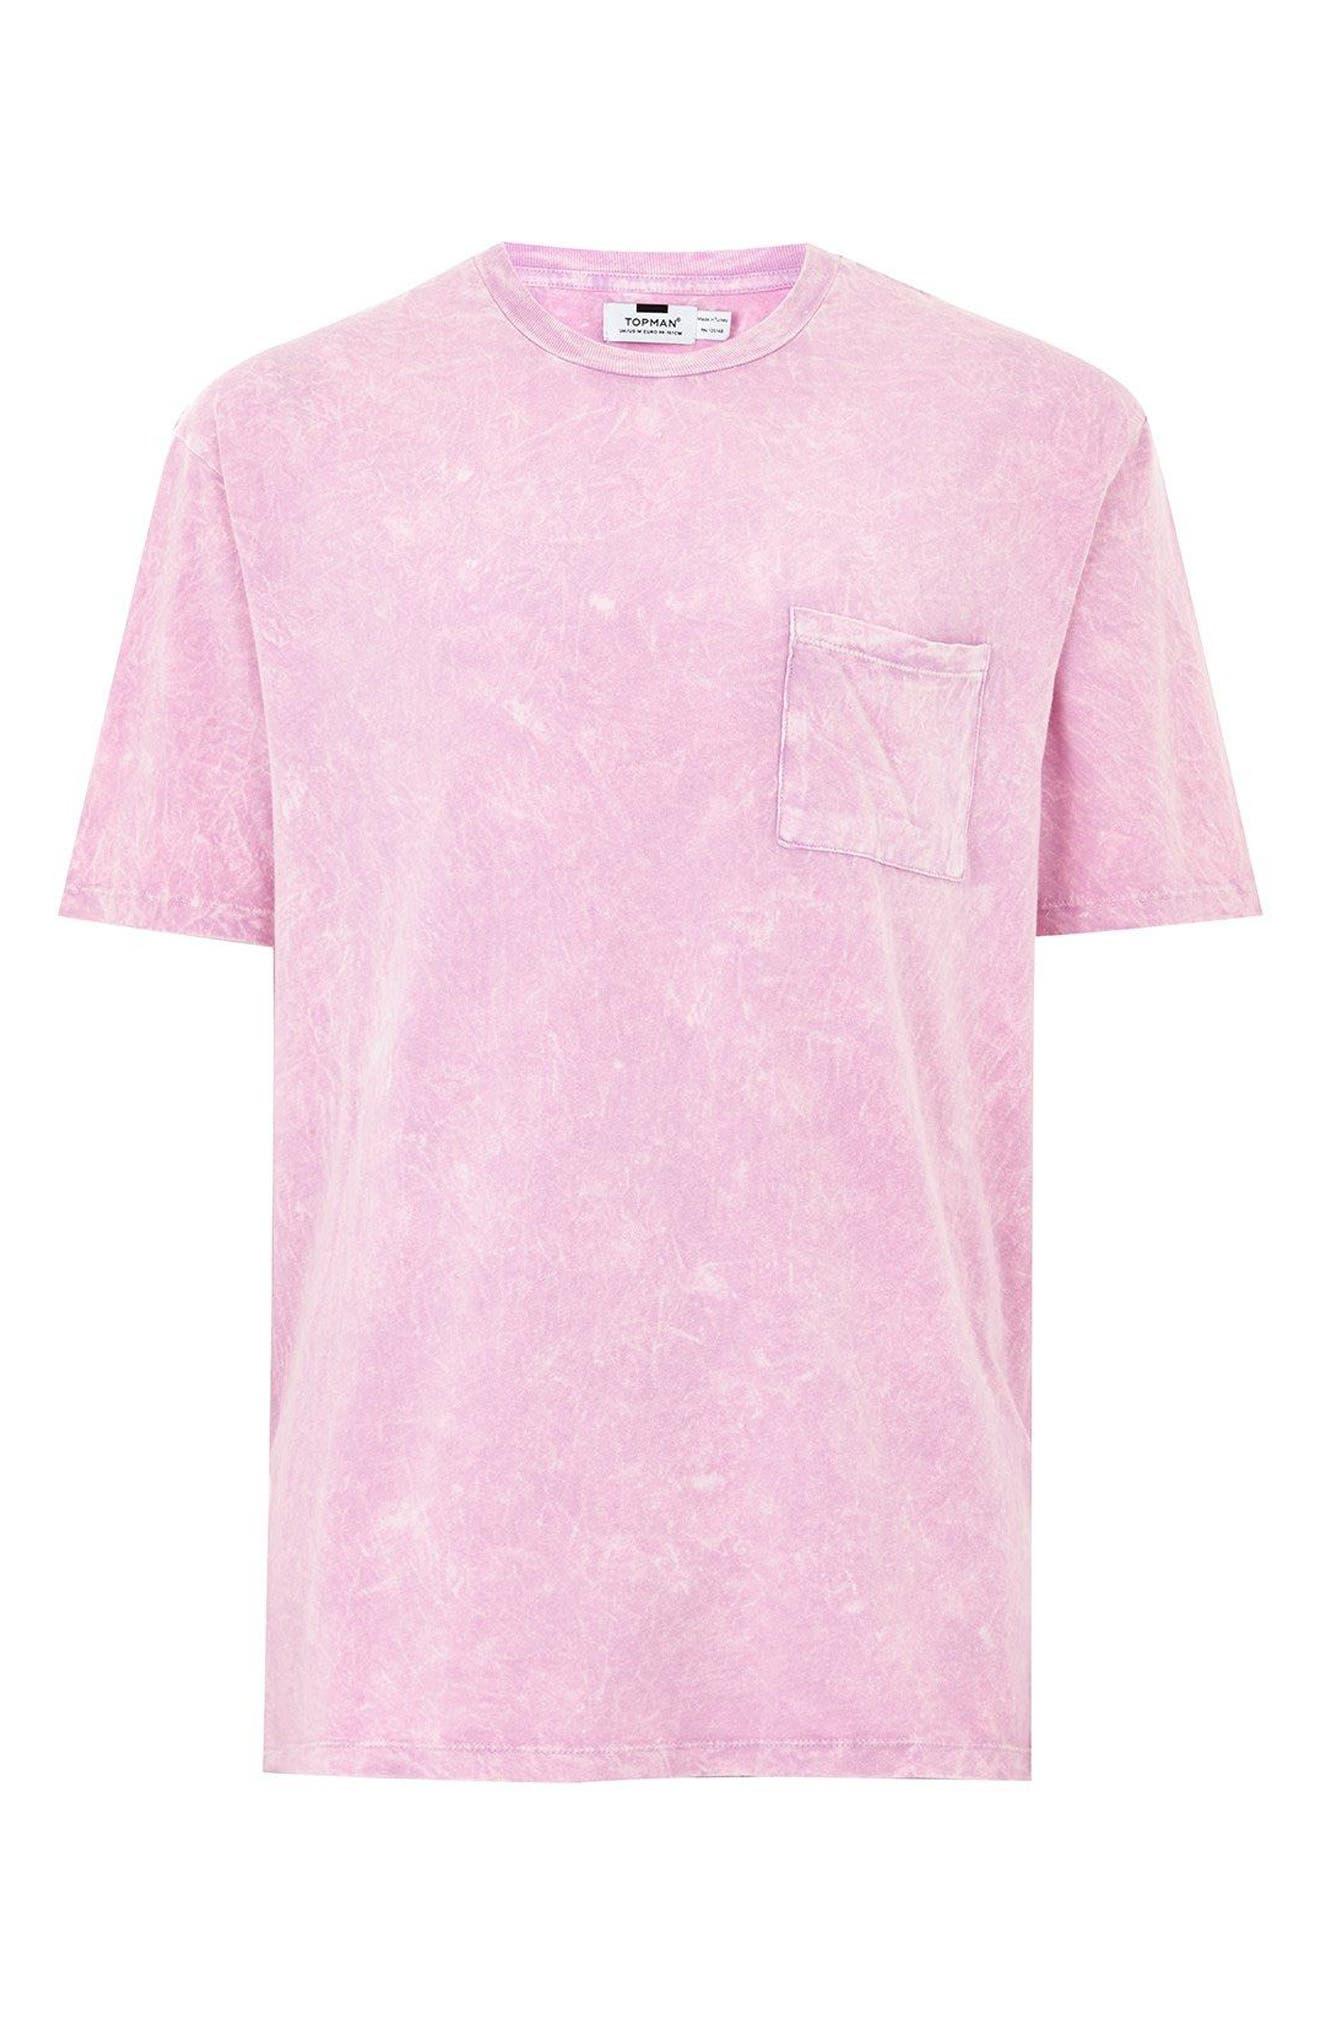 Acid Wash Pocket T-Shirt,                             Alternate thumbnail 4, color,                             Pink Multi